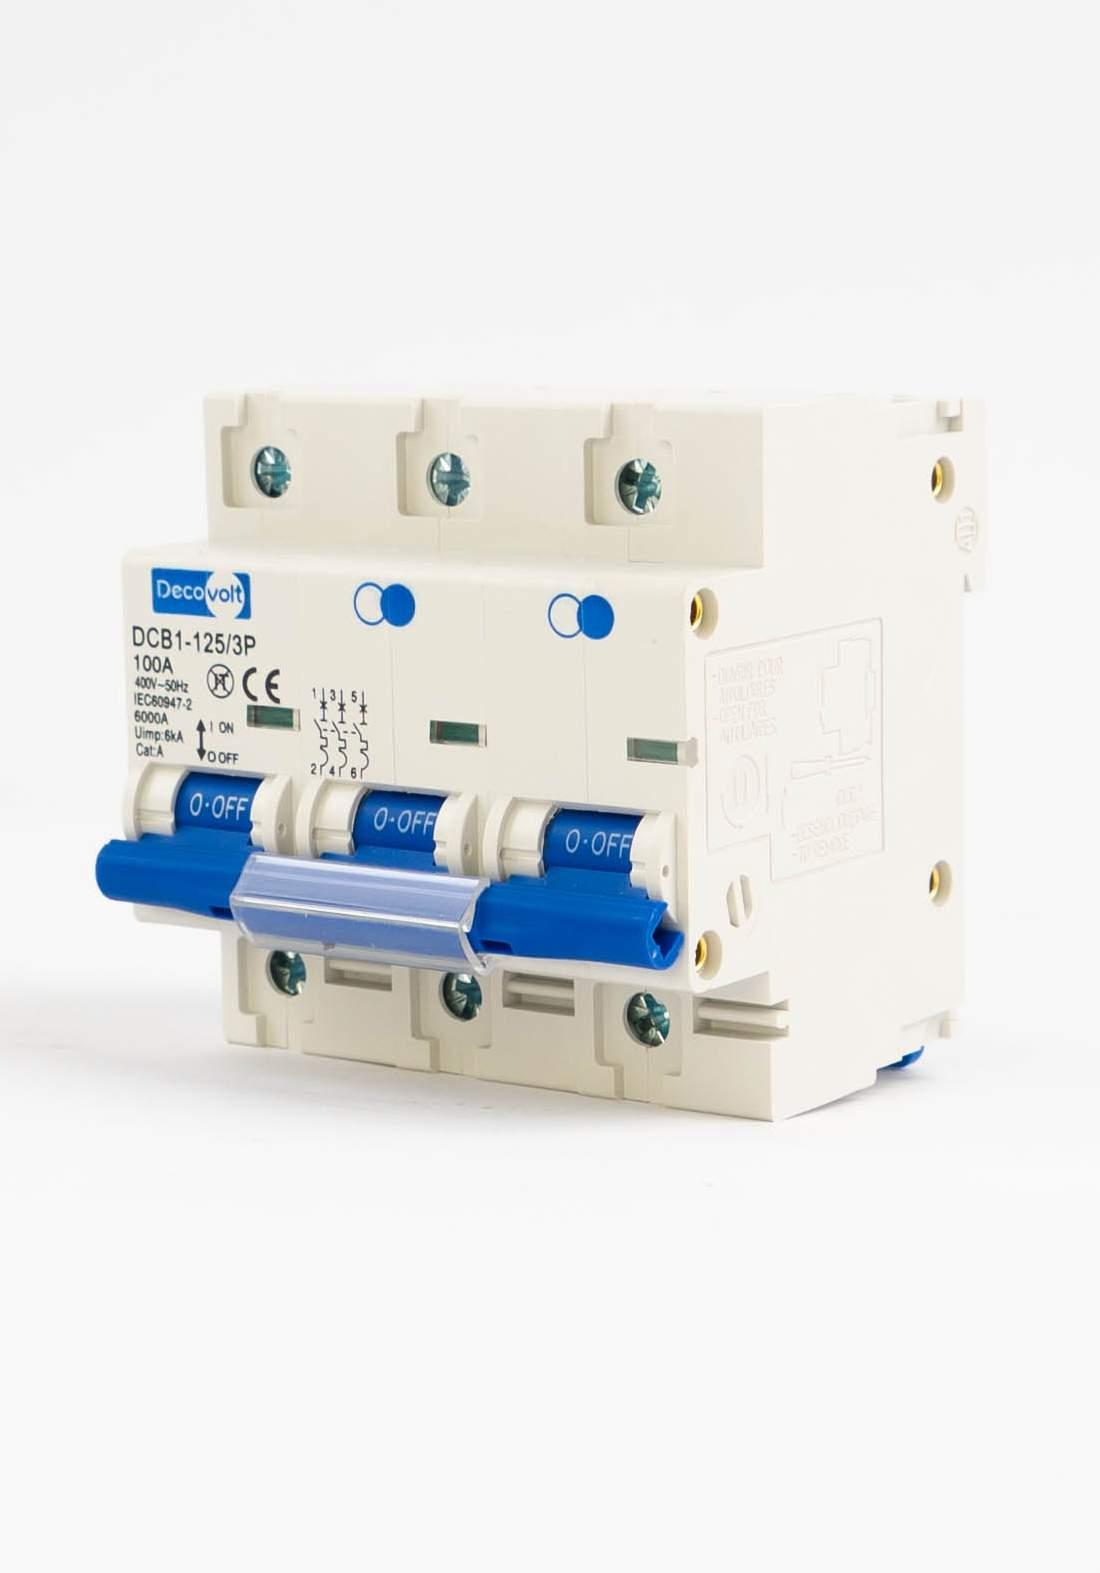 DecoVolt 2624 Triple drill 125 ampere جوزة 125 ثلاثي